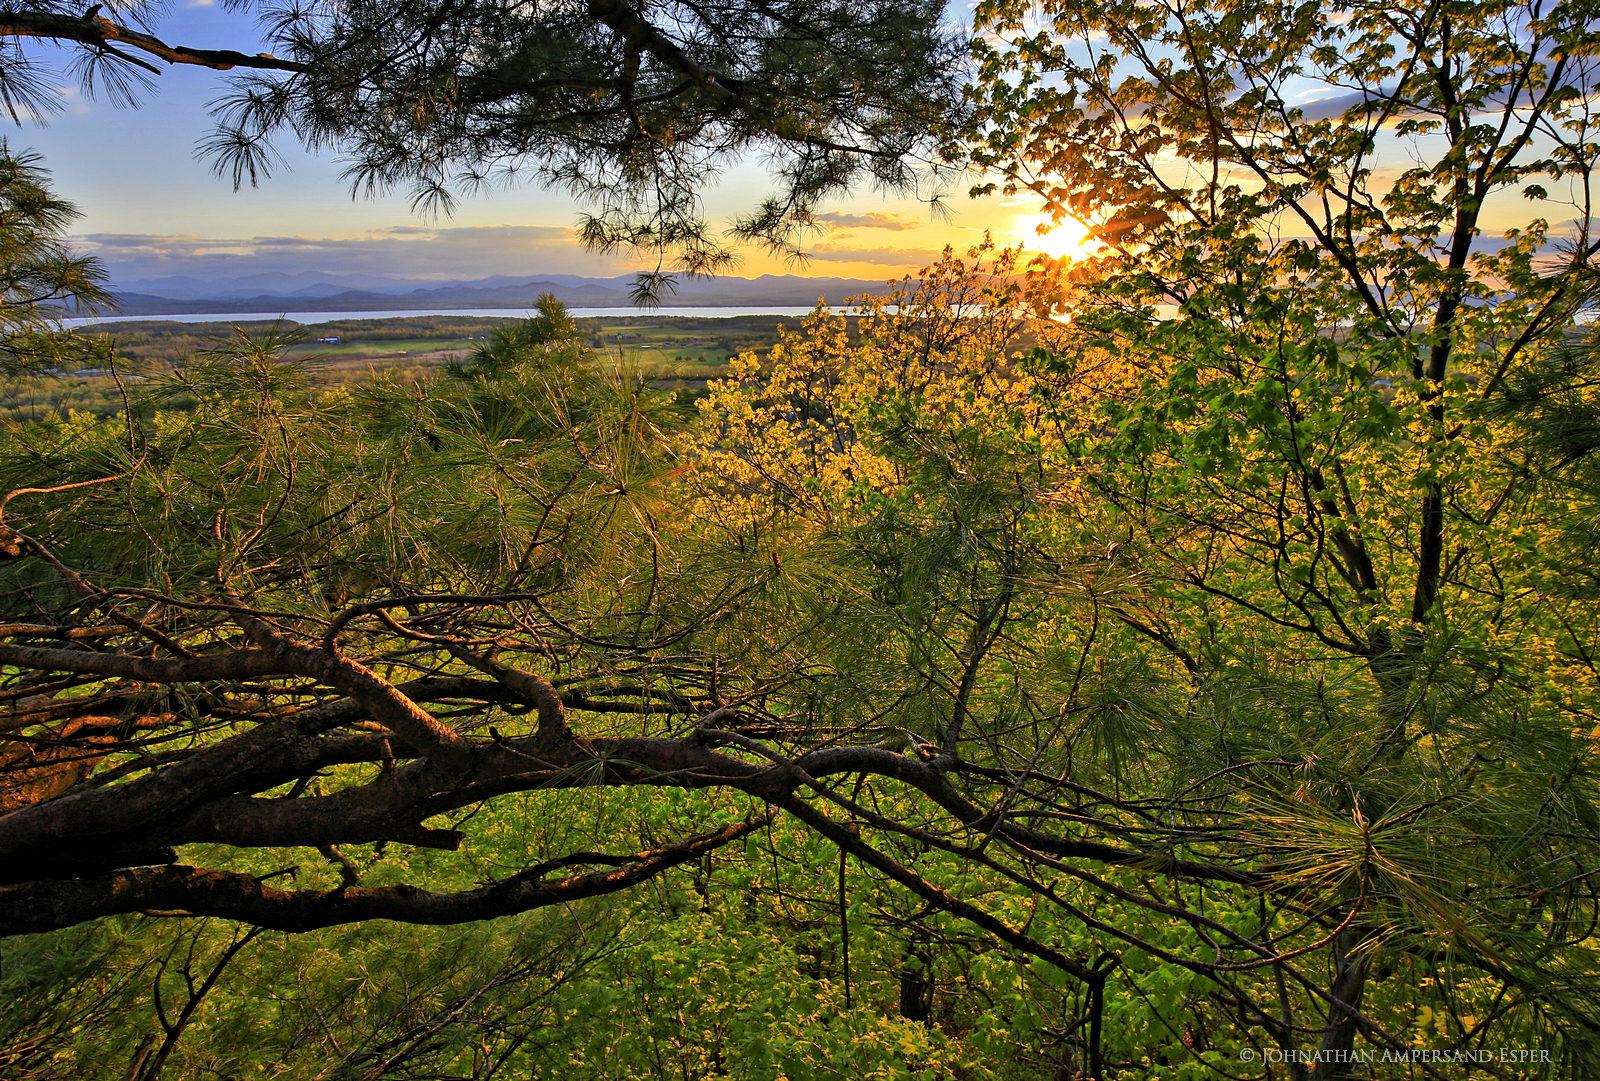 Lake Champlain,valley,Lake Champlain Valley,treetop,Vermont,sunset,Adirondack Mountains,Adirondacks,